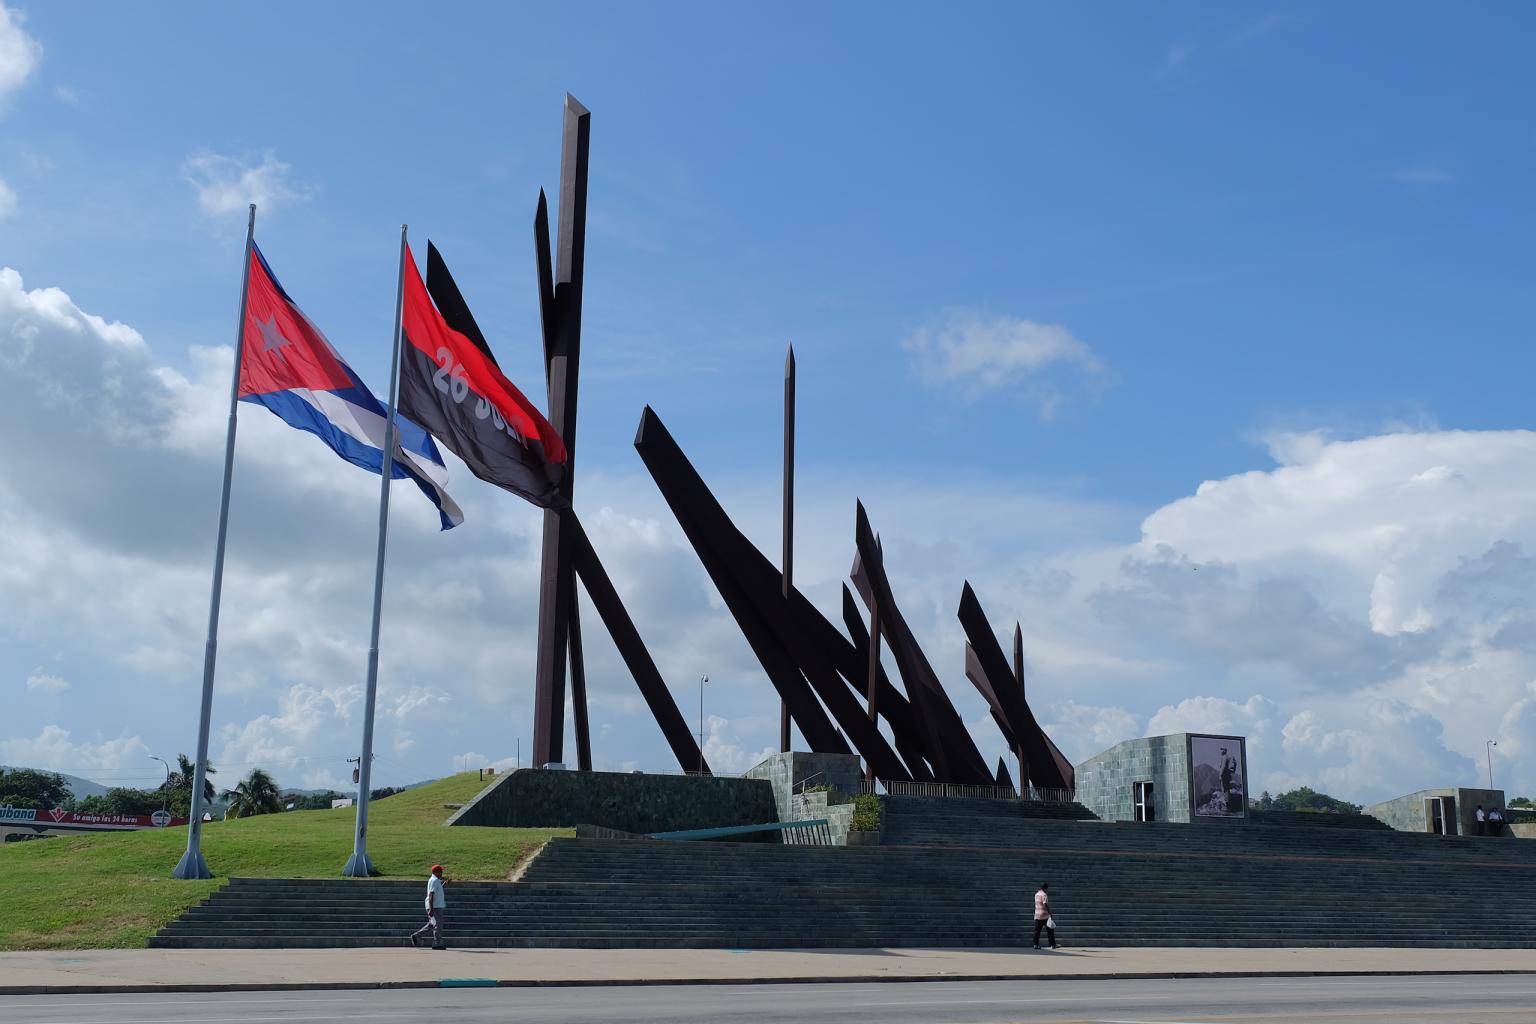 Plaza Antonio Maceo Grajales